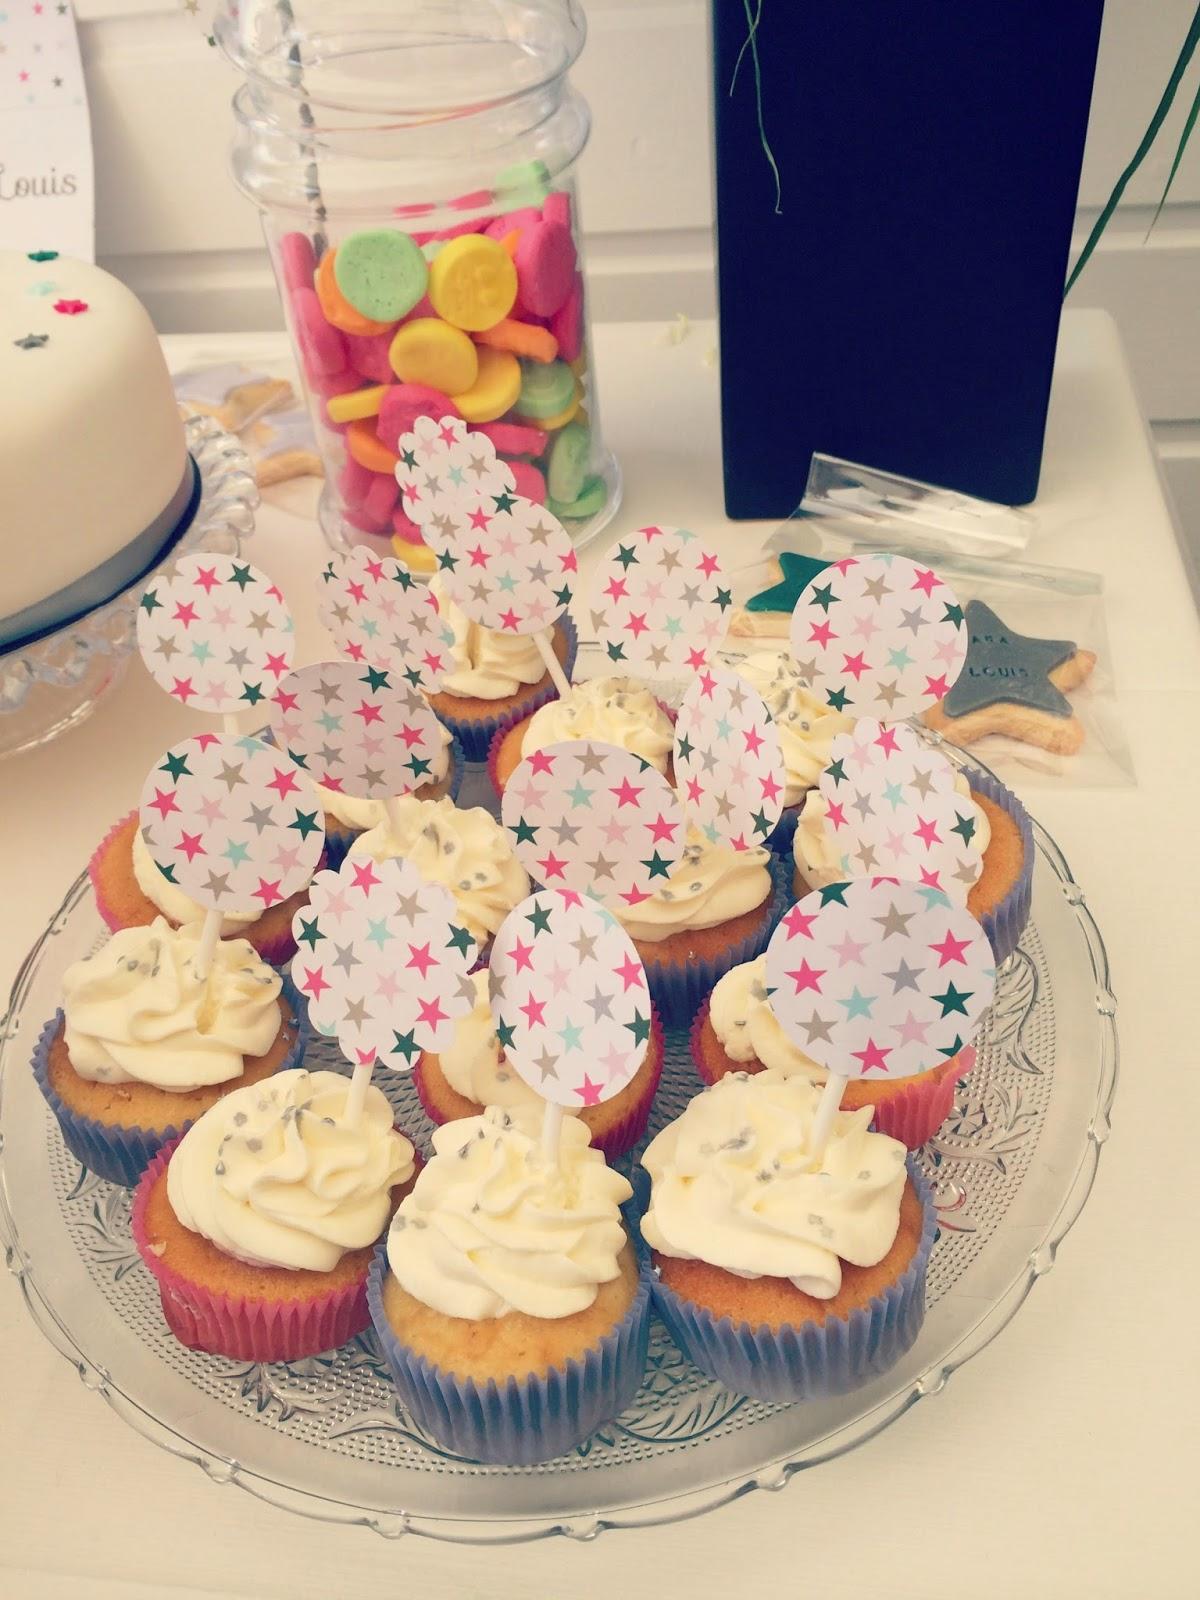 cupcake decores avec etoile